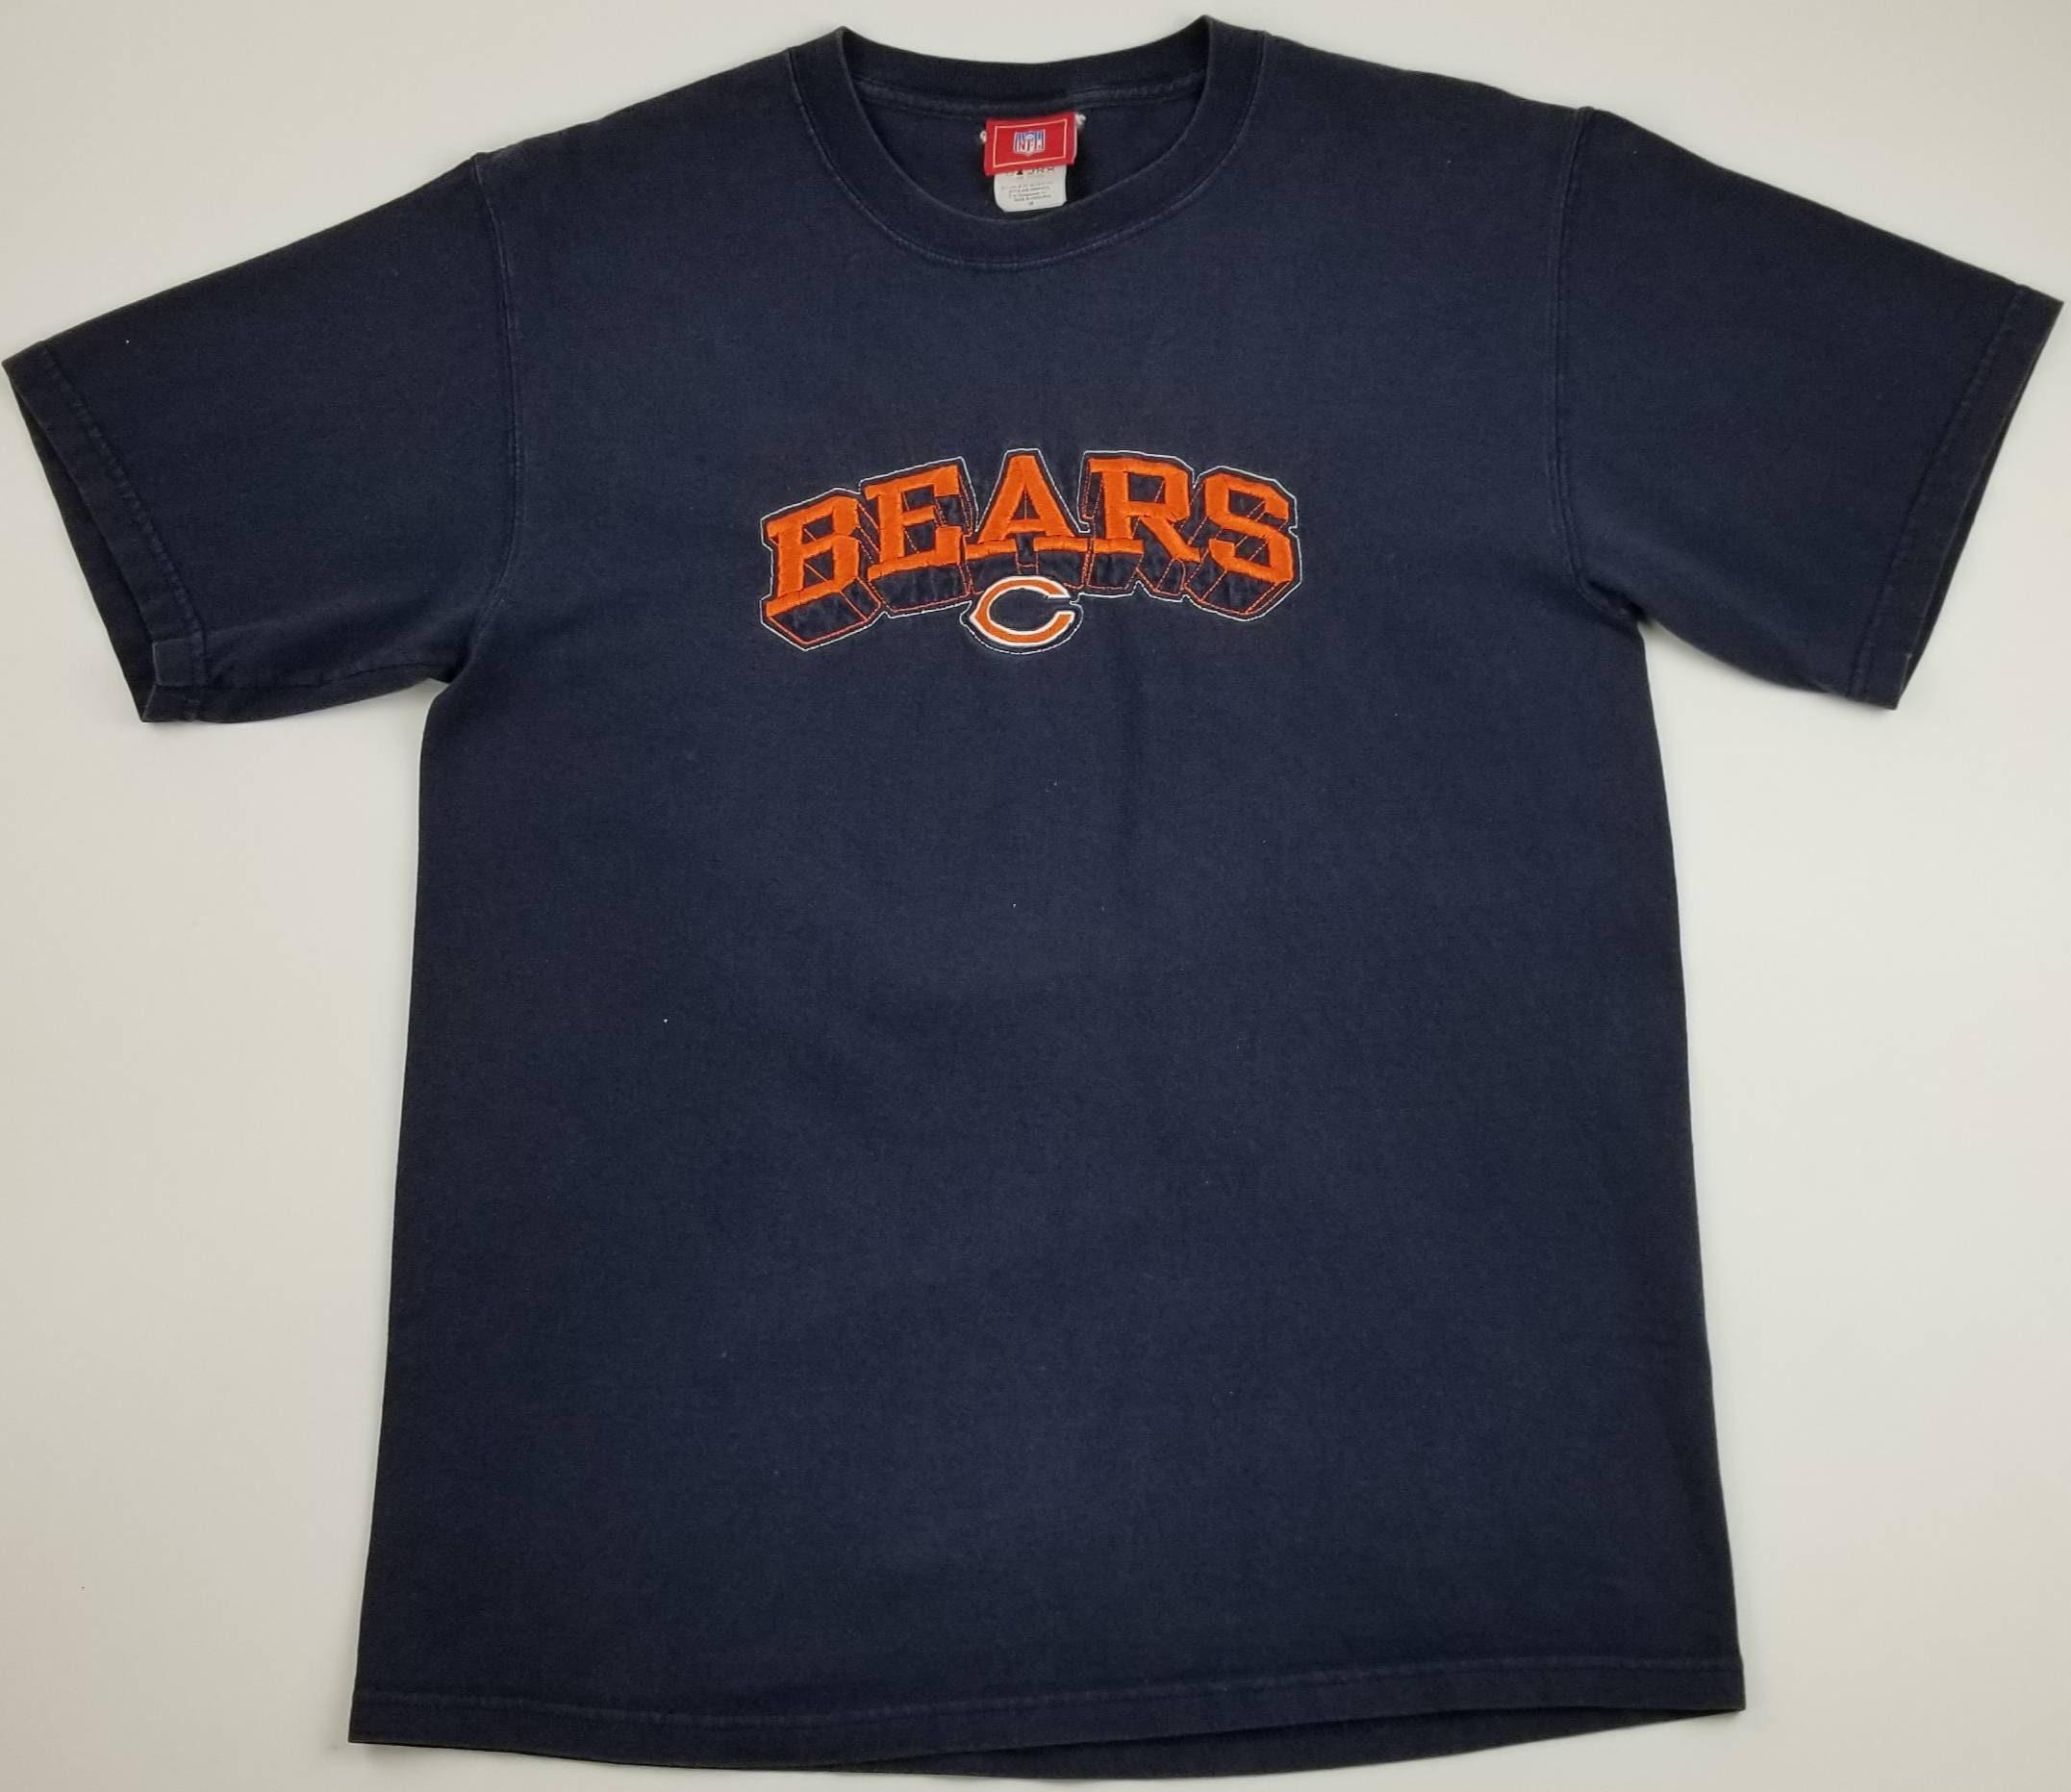 128cc397 Vintage Chicago Bears NFL Sewn / Stitched / Embroidered Blue Football  T-shirt Size Medium - bulls cubs white sox blackhawks hip hop rap tee